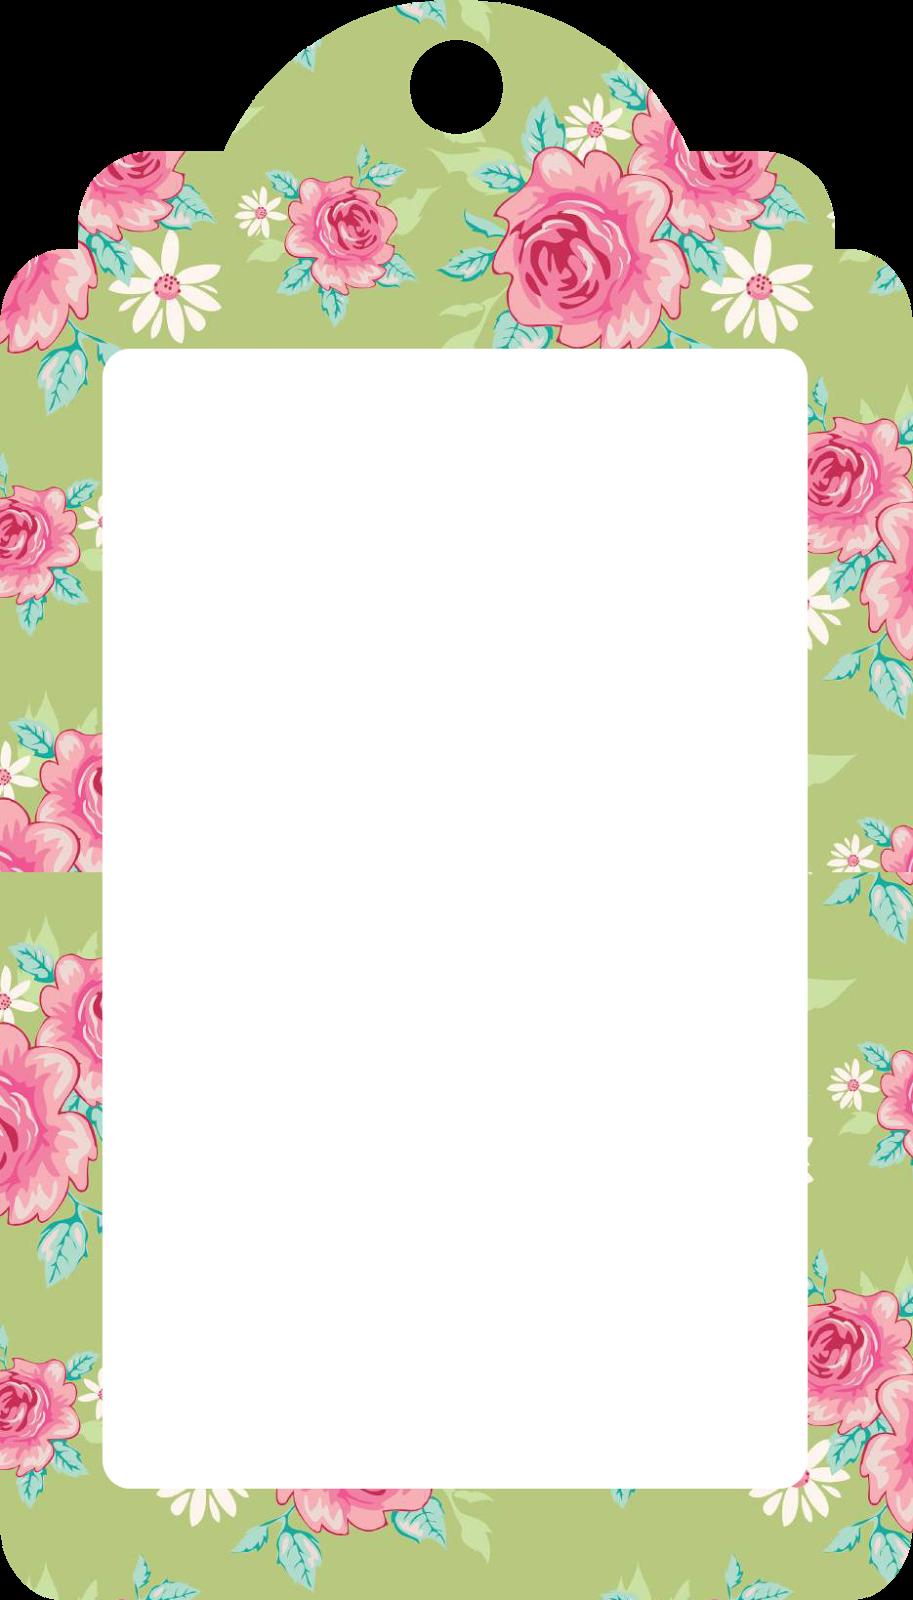 Tag/etiquetas grátis para imprimir | Pinterest | Tags, Rahmen und ...